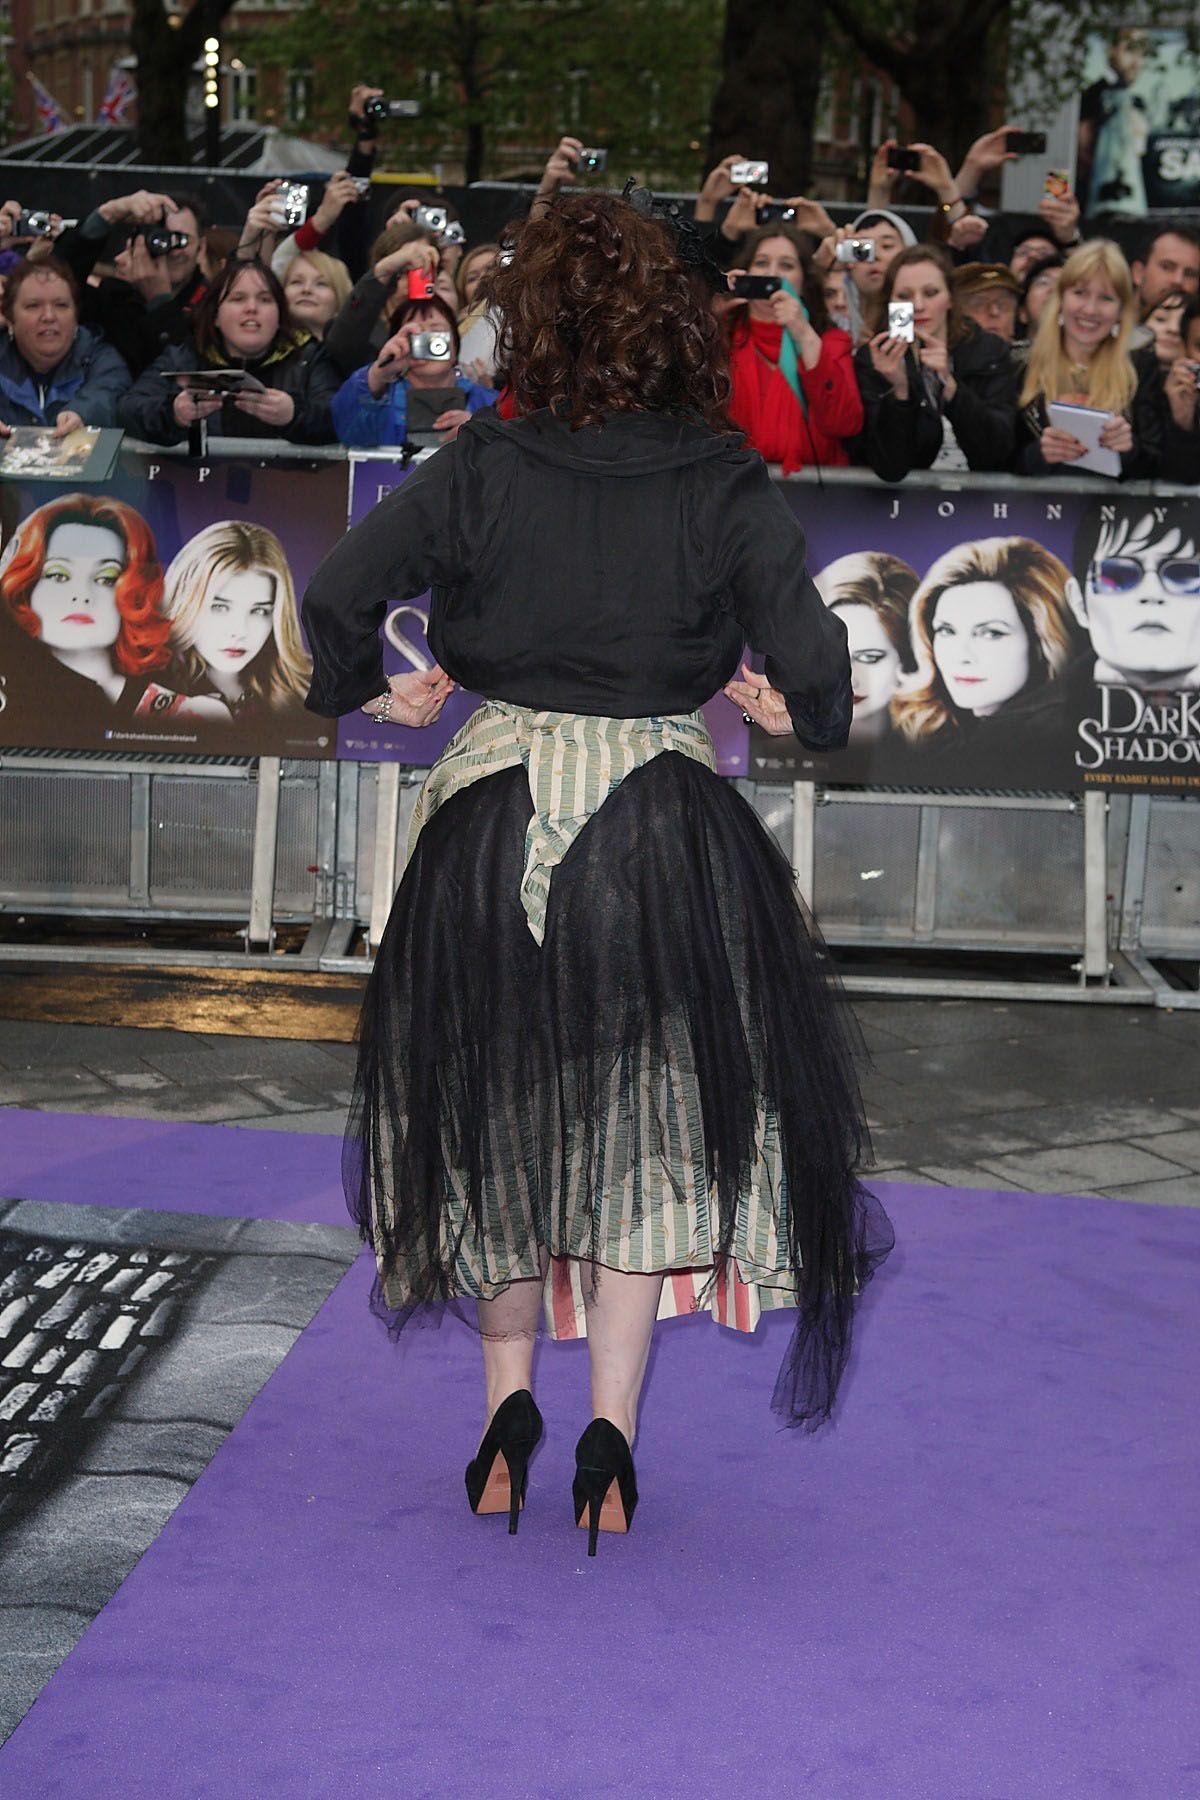 Dark Shadows London Premiere - Helena Bonham Carter Photo (30783717) - Fanpop fanclubs